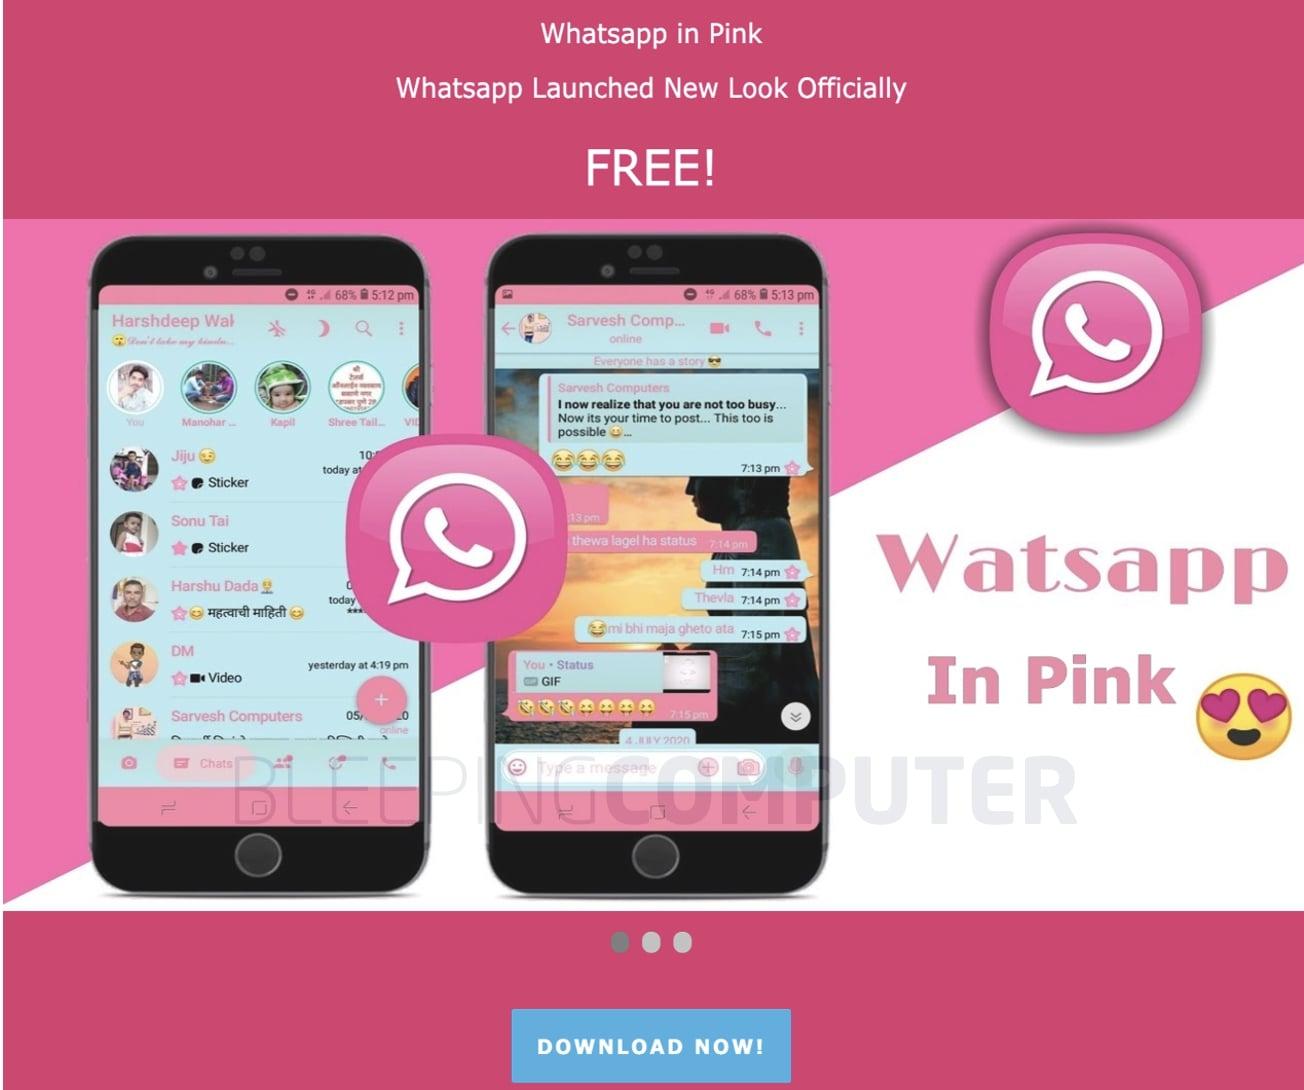 whatsapp pink scam site